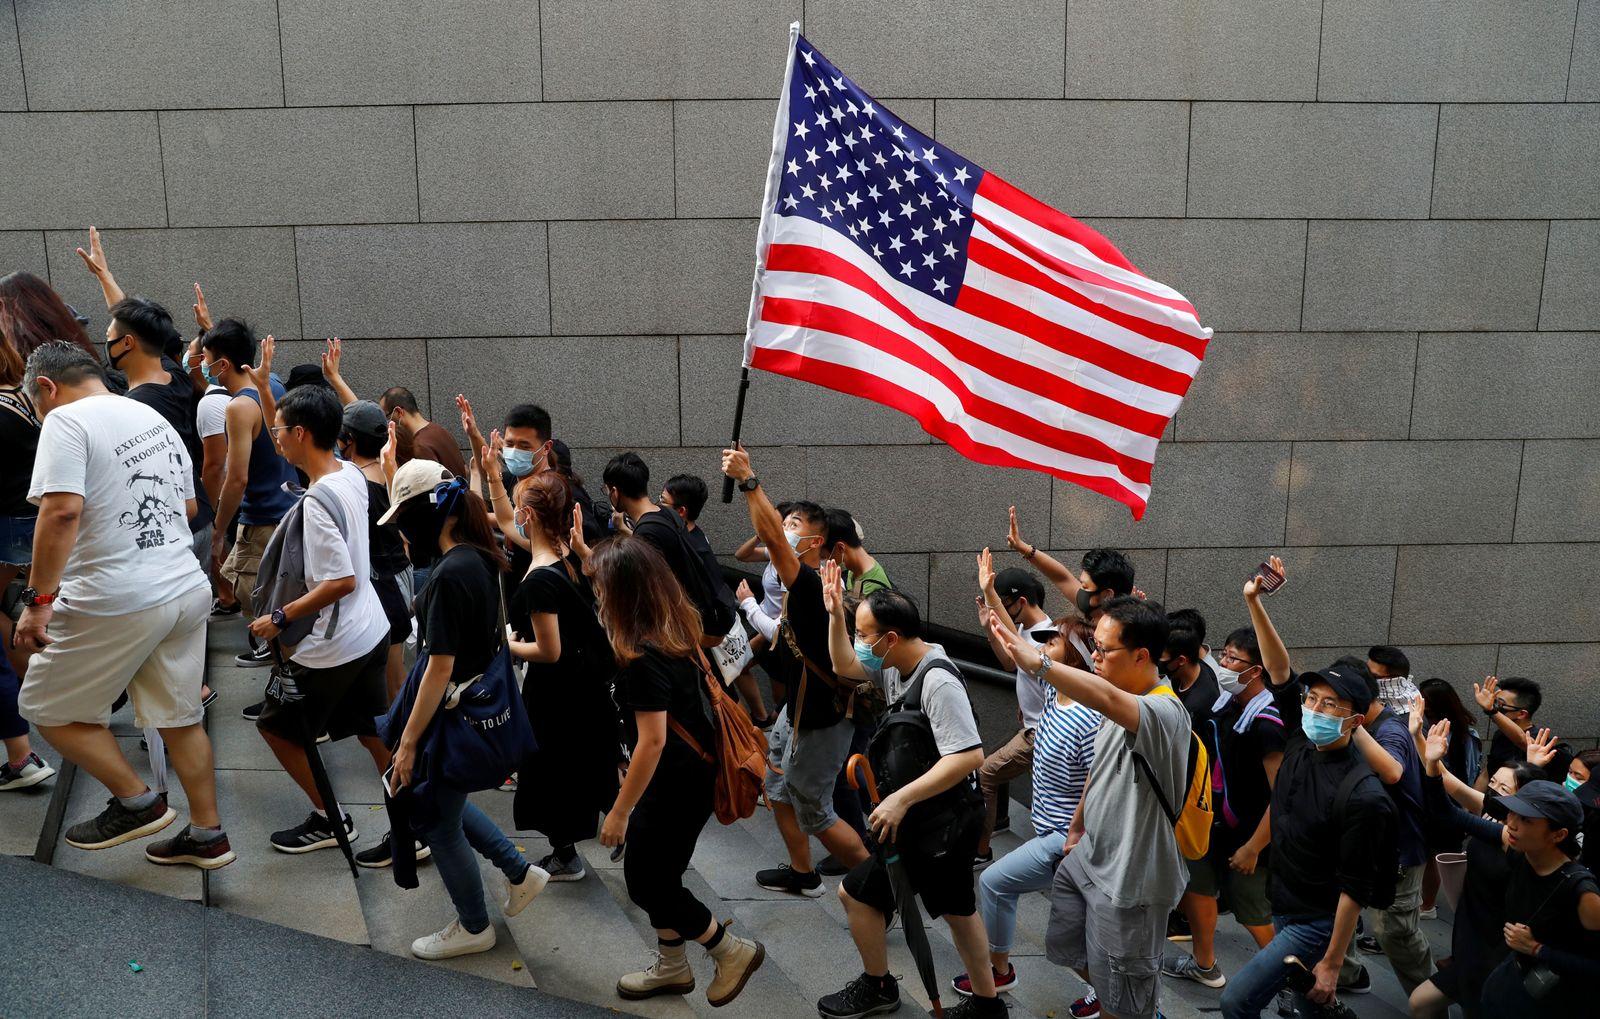 Hongkong/ Protest/ Demonstration/ USA Flaggen